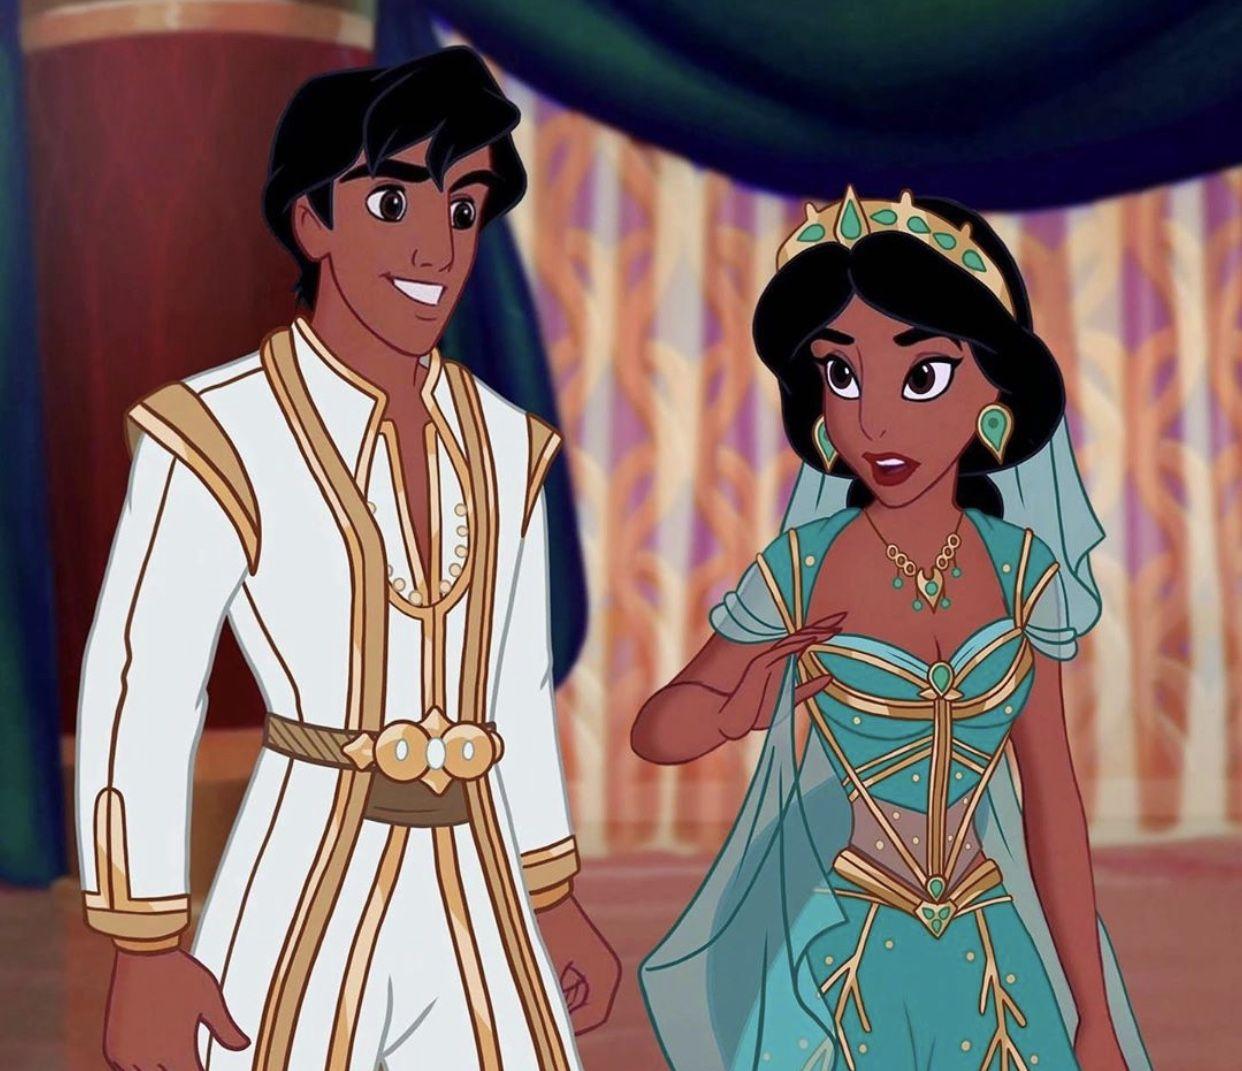 Princess Jasmine and Aladdin as Prince Ali from Disney's